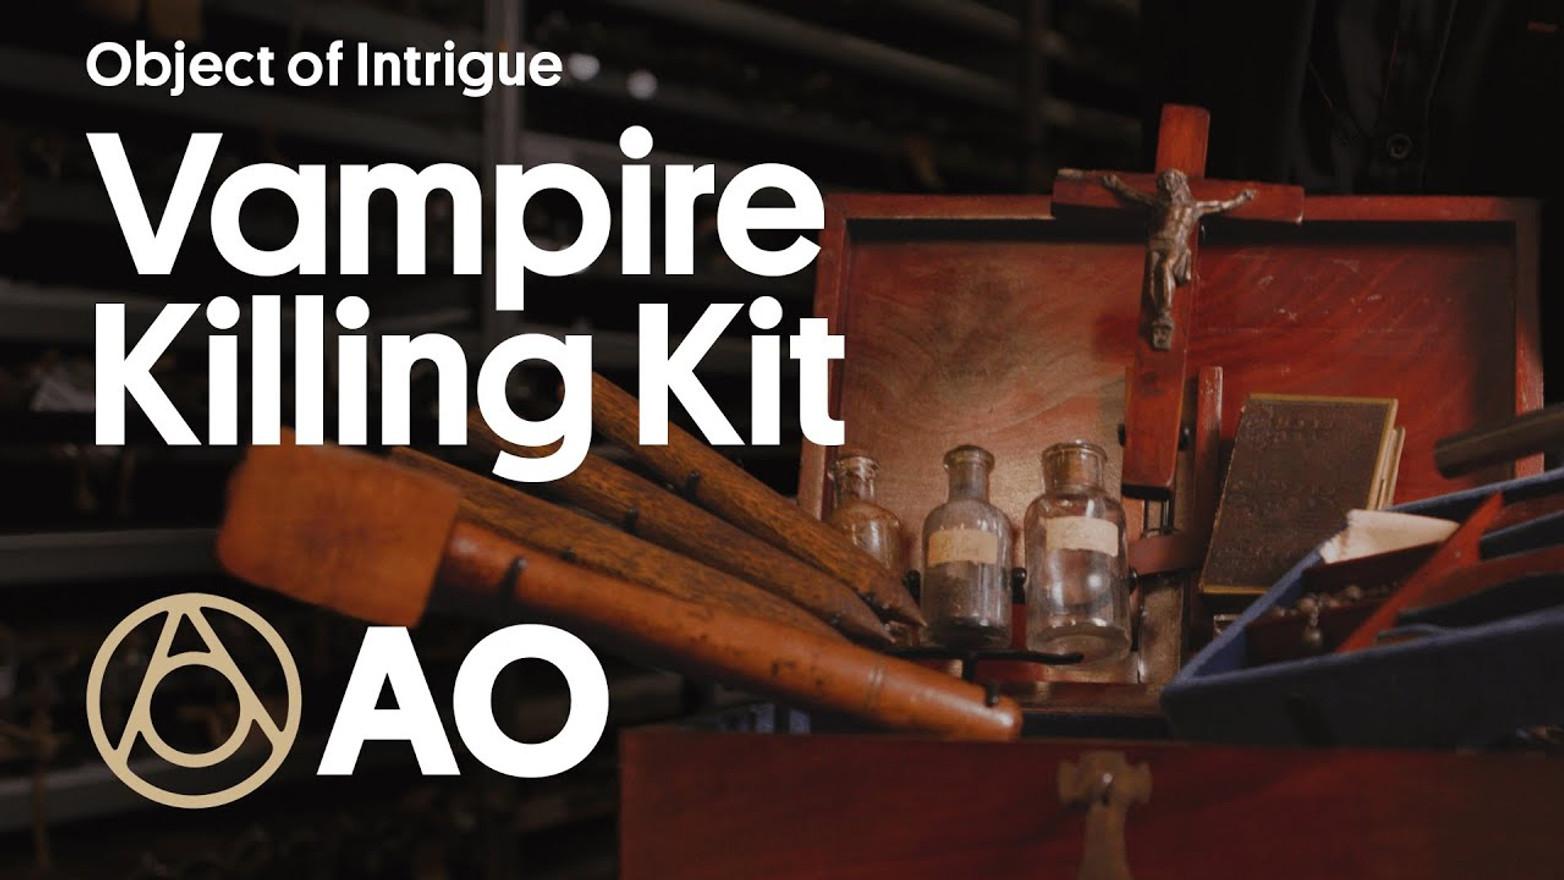 OOI - Vampire Killing Kit